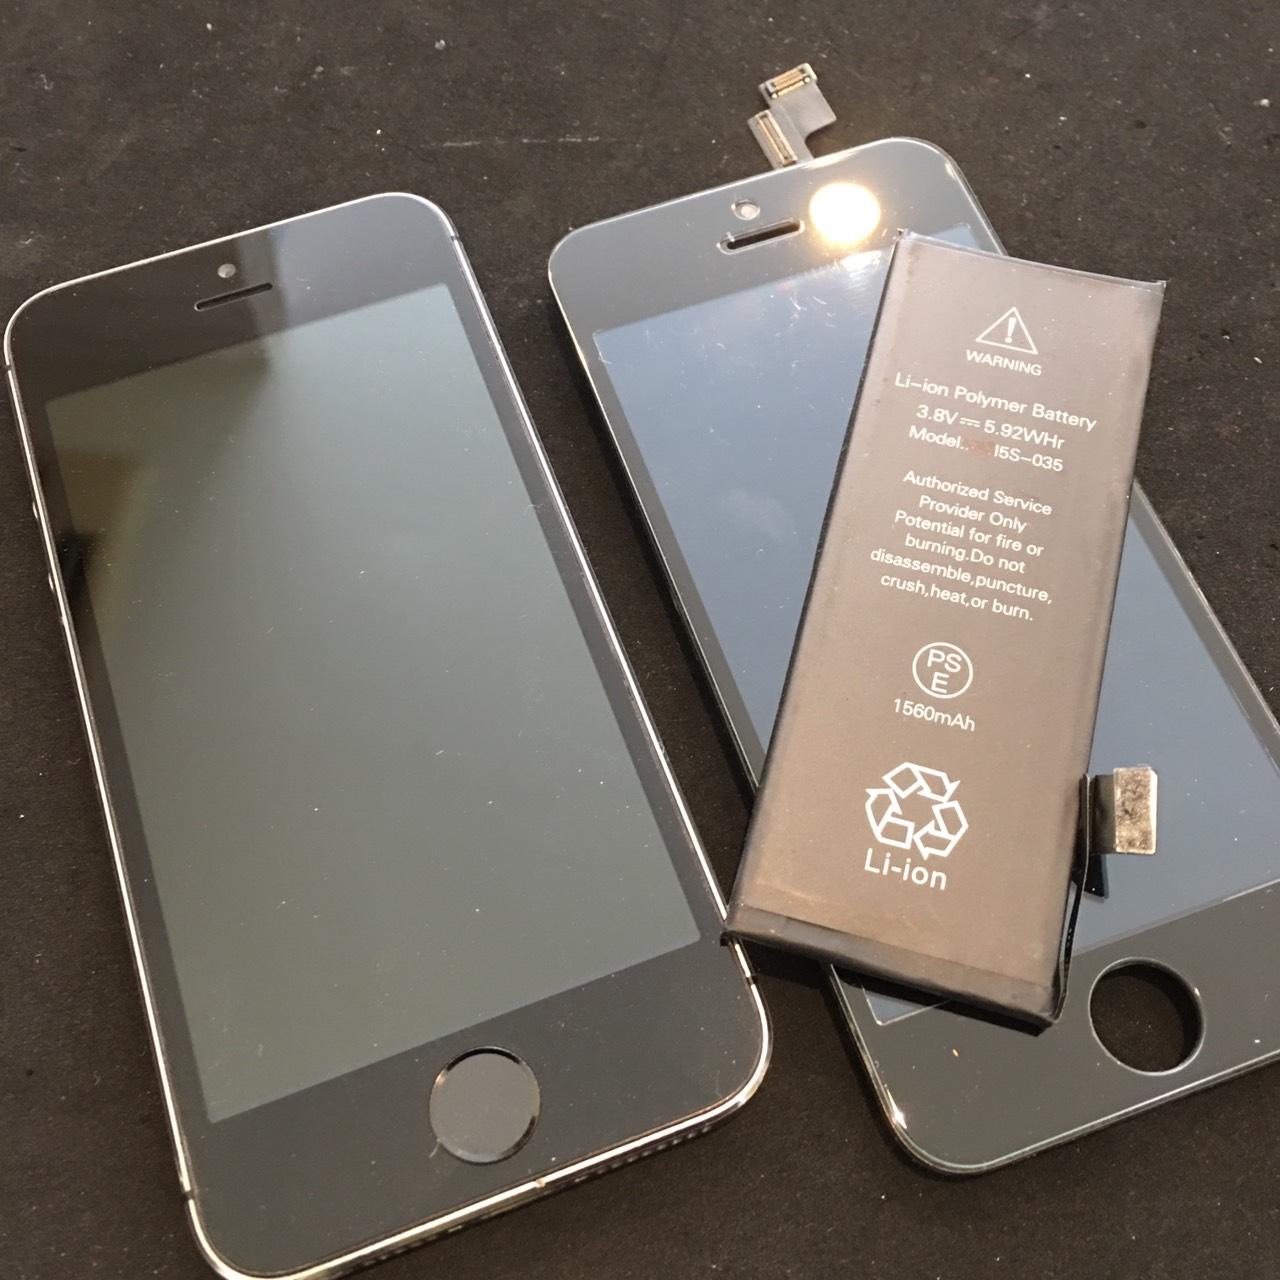 0721|iPhone5s|液晶パネル交換修理|バッテリー交換